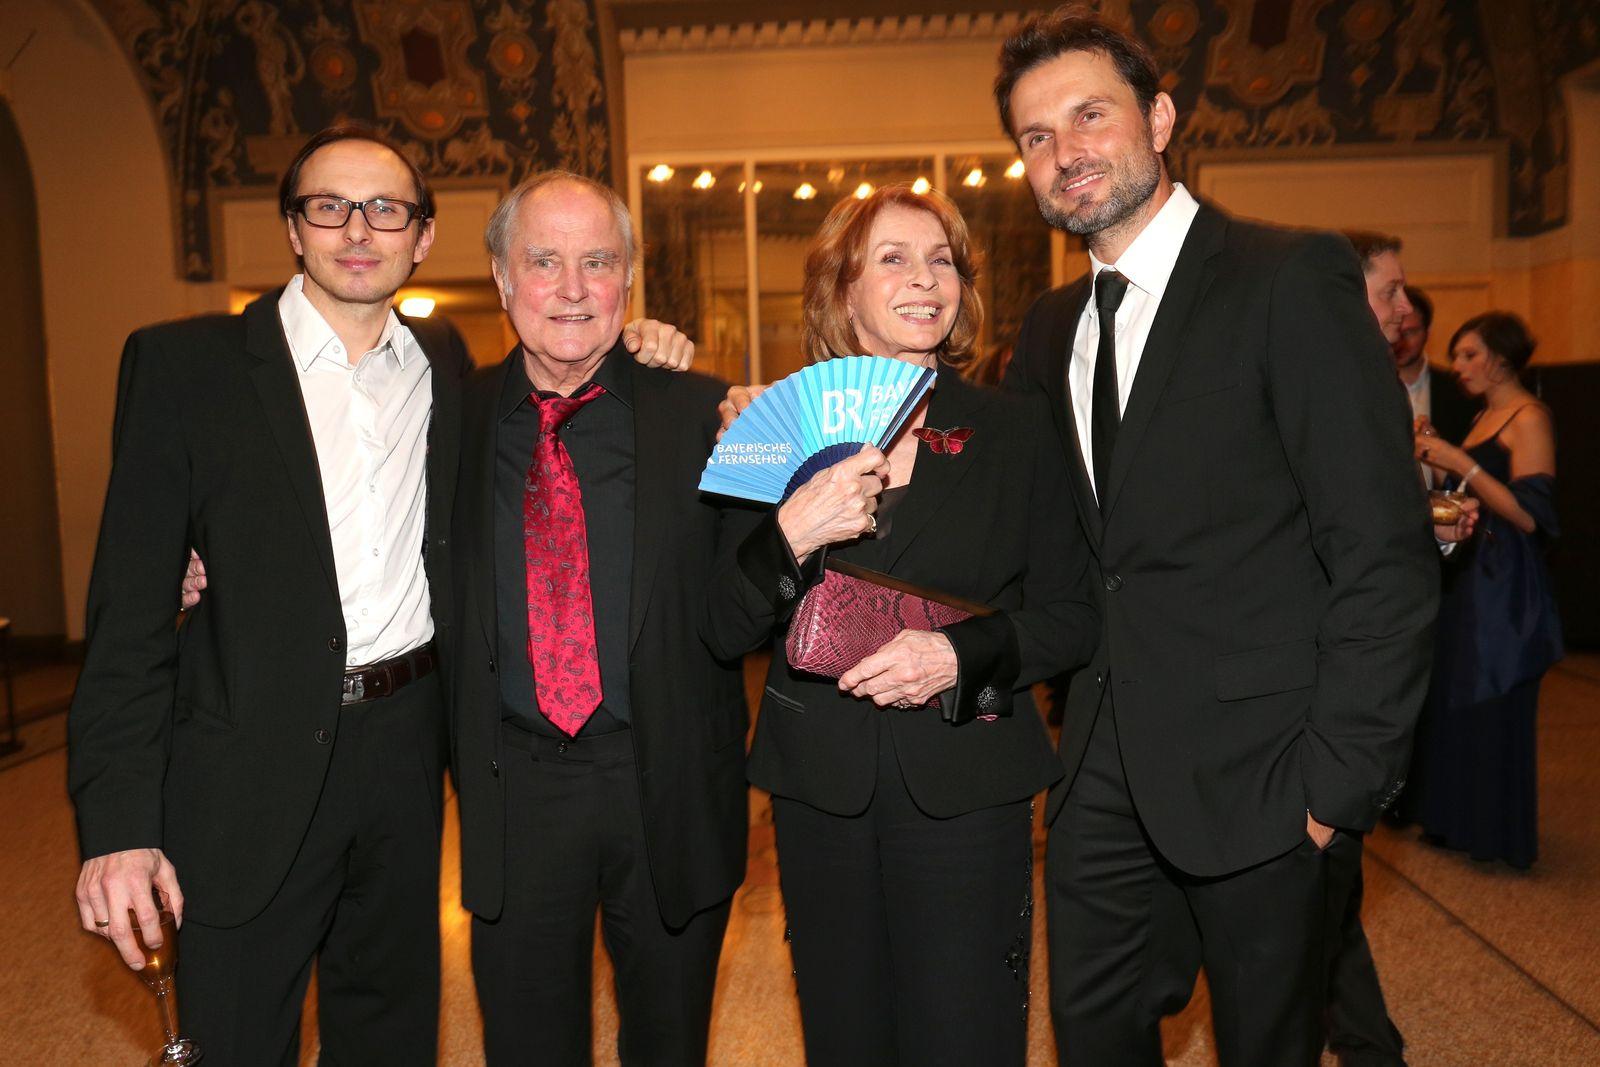 Michael Verhoeven - Bavarian Film Award 2016